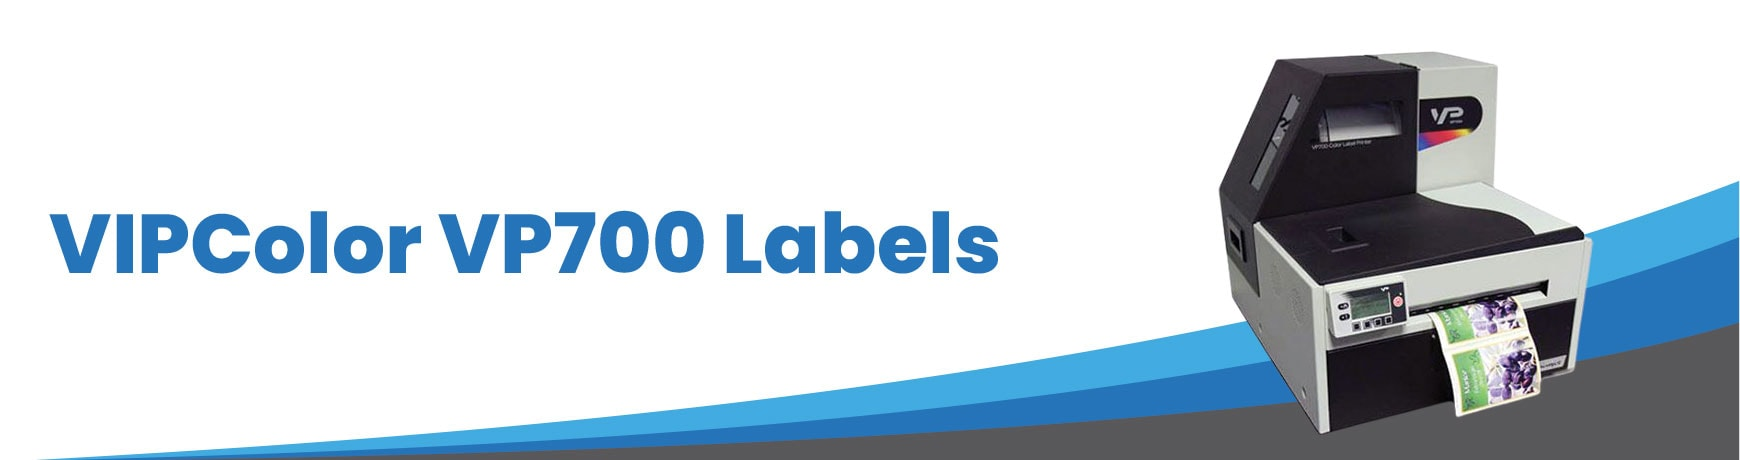 VIPColor VP700 Labels